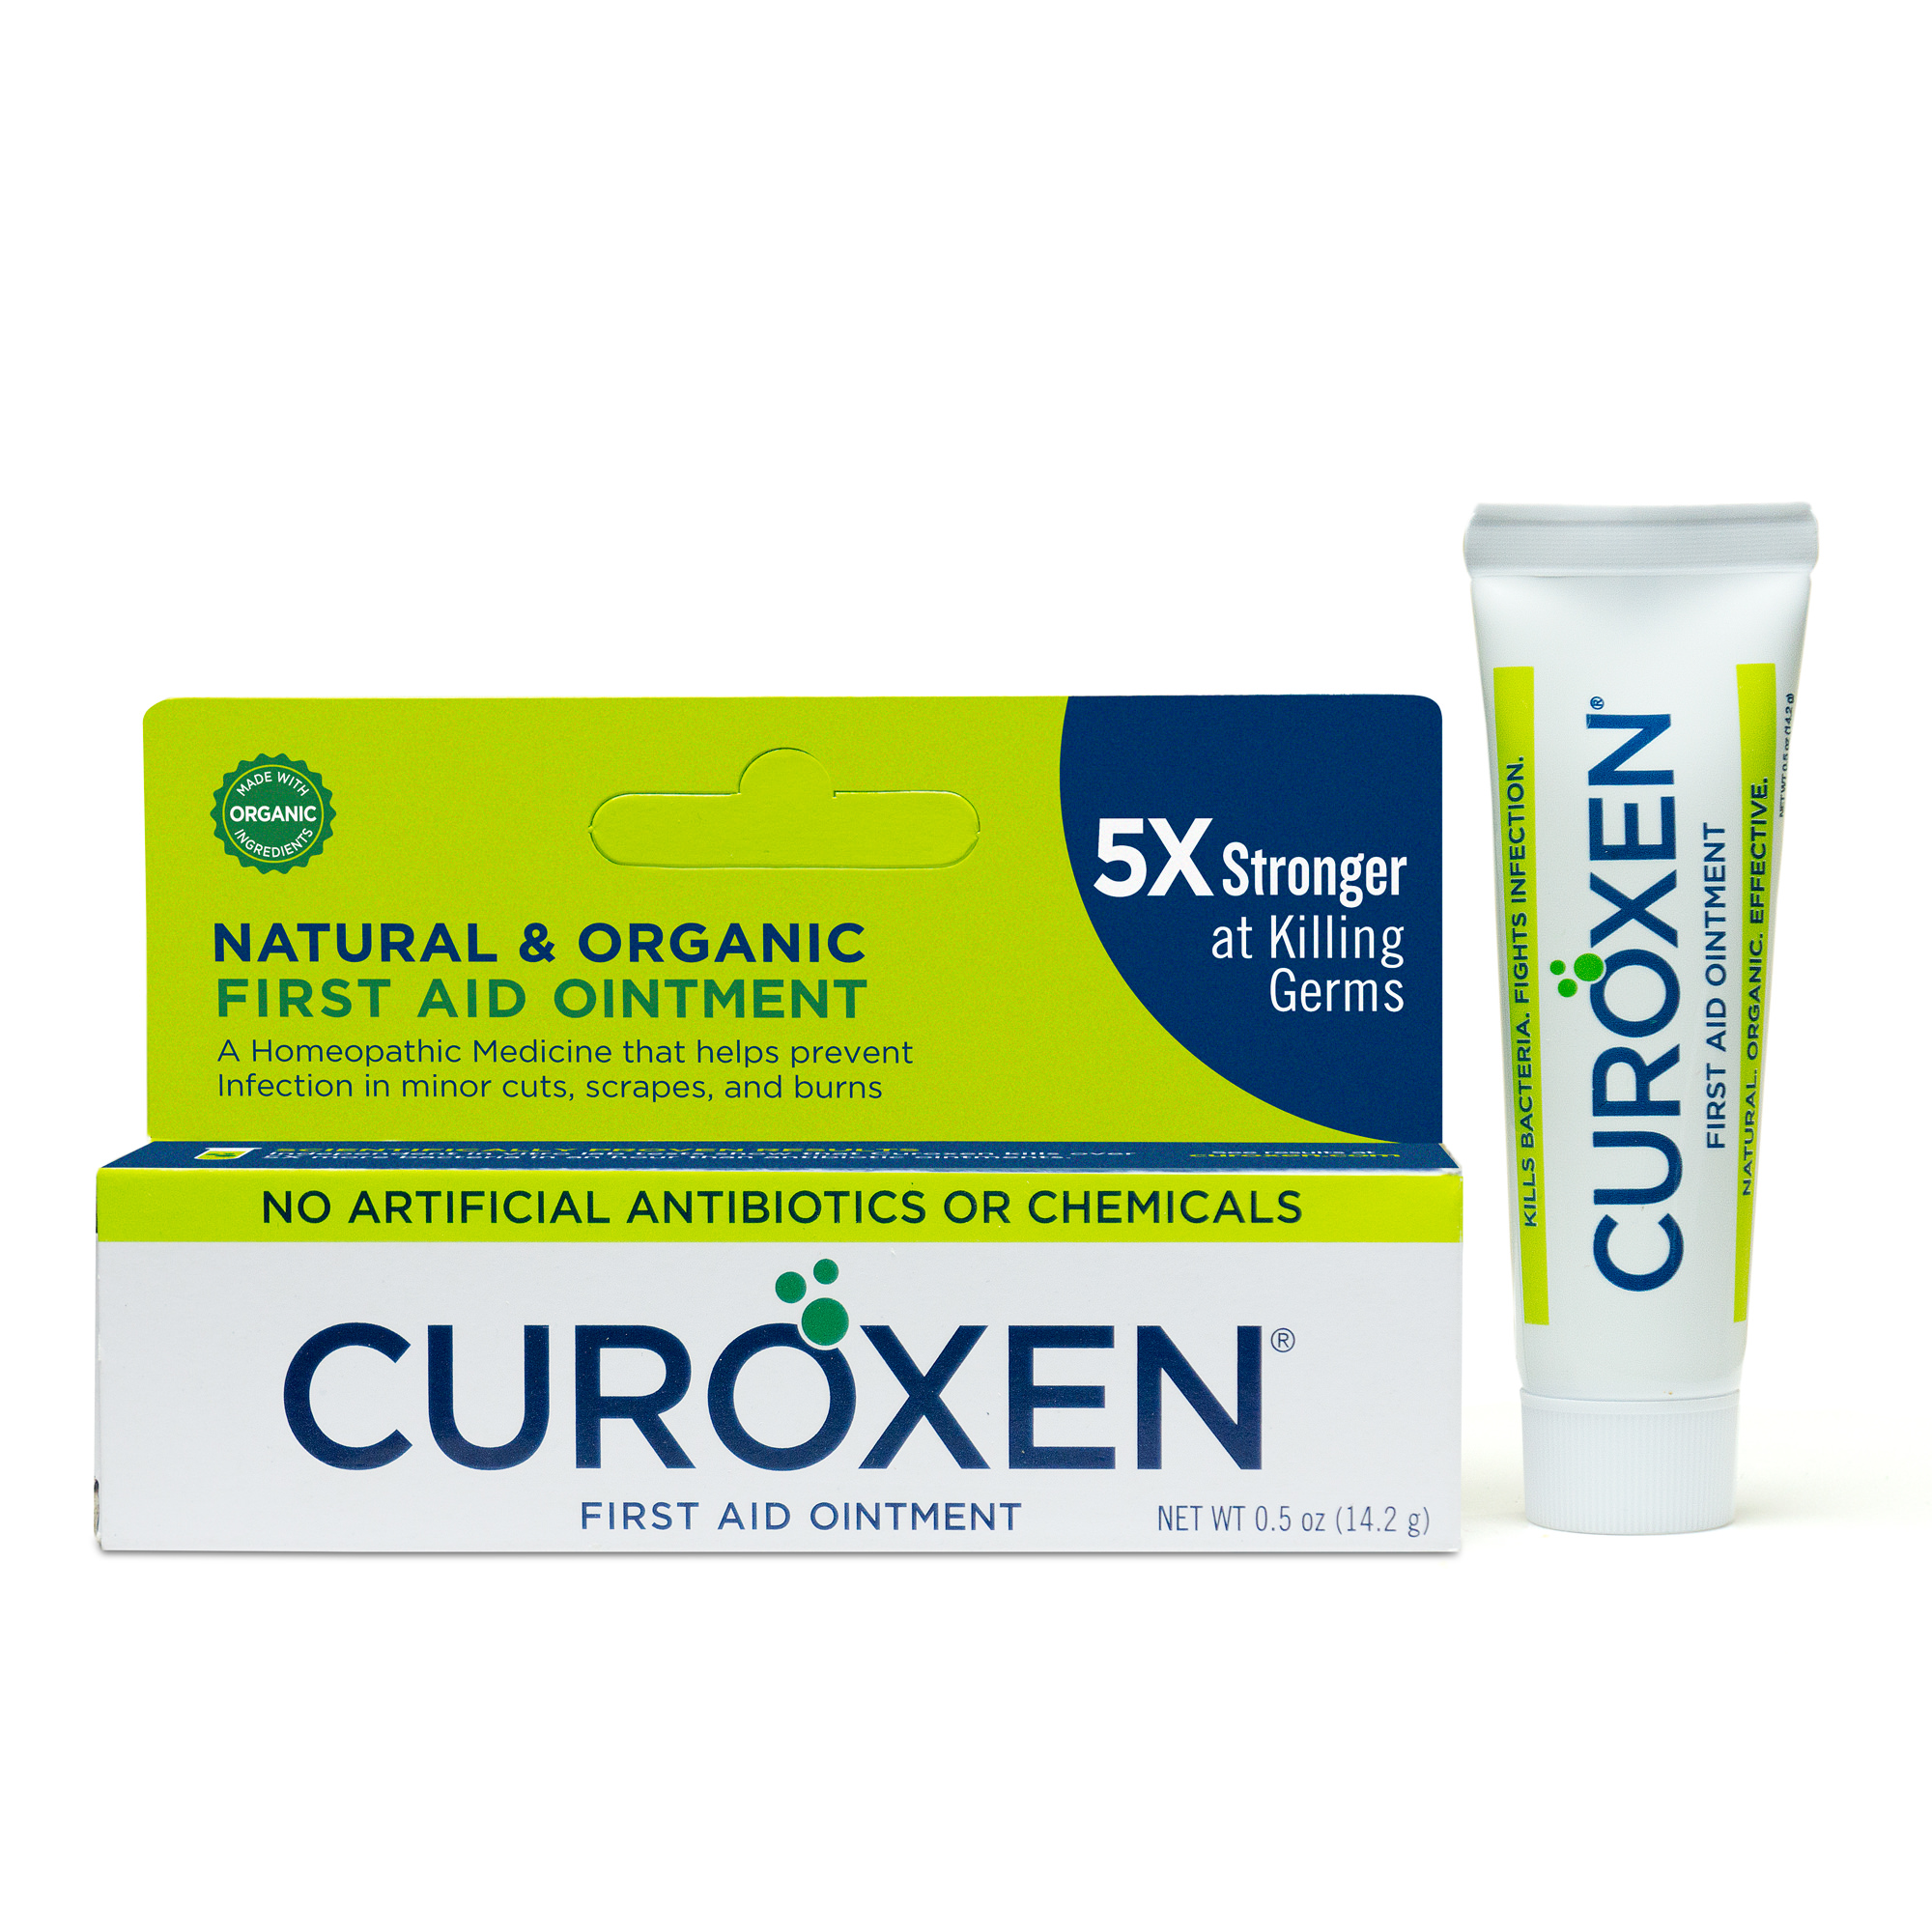 CUROXEN Natural & Organic First Aid Ointment 0.5 oz